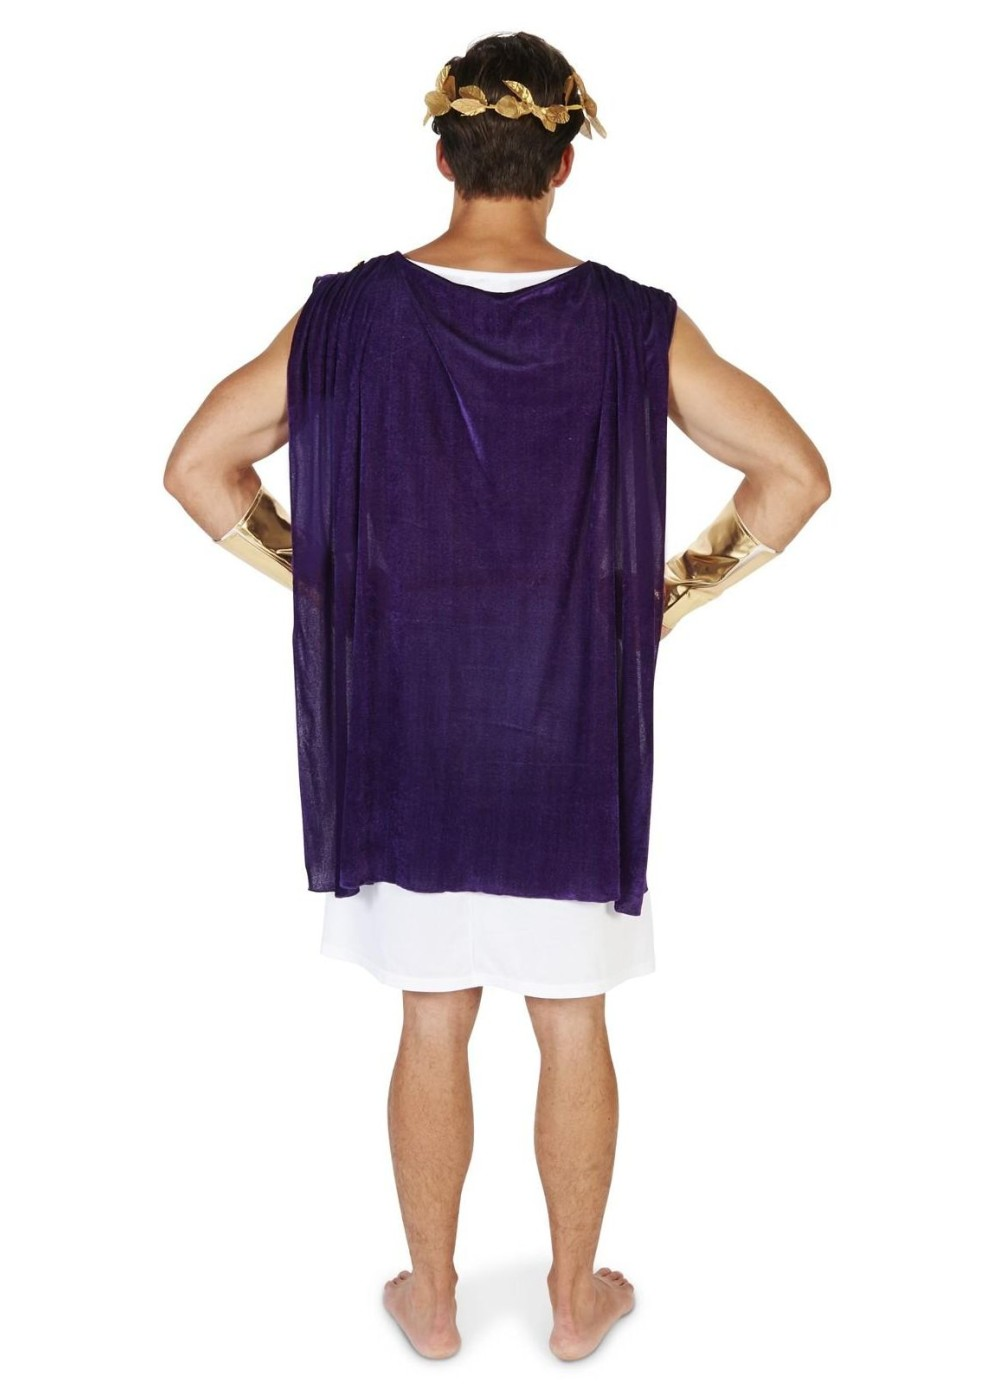 Men S Roman Toga Costume Roman Costumes